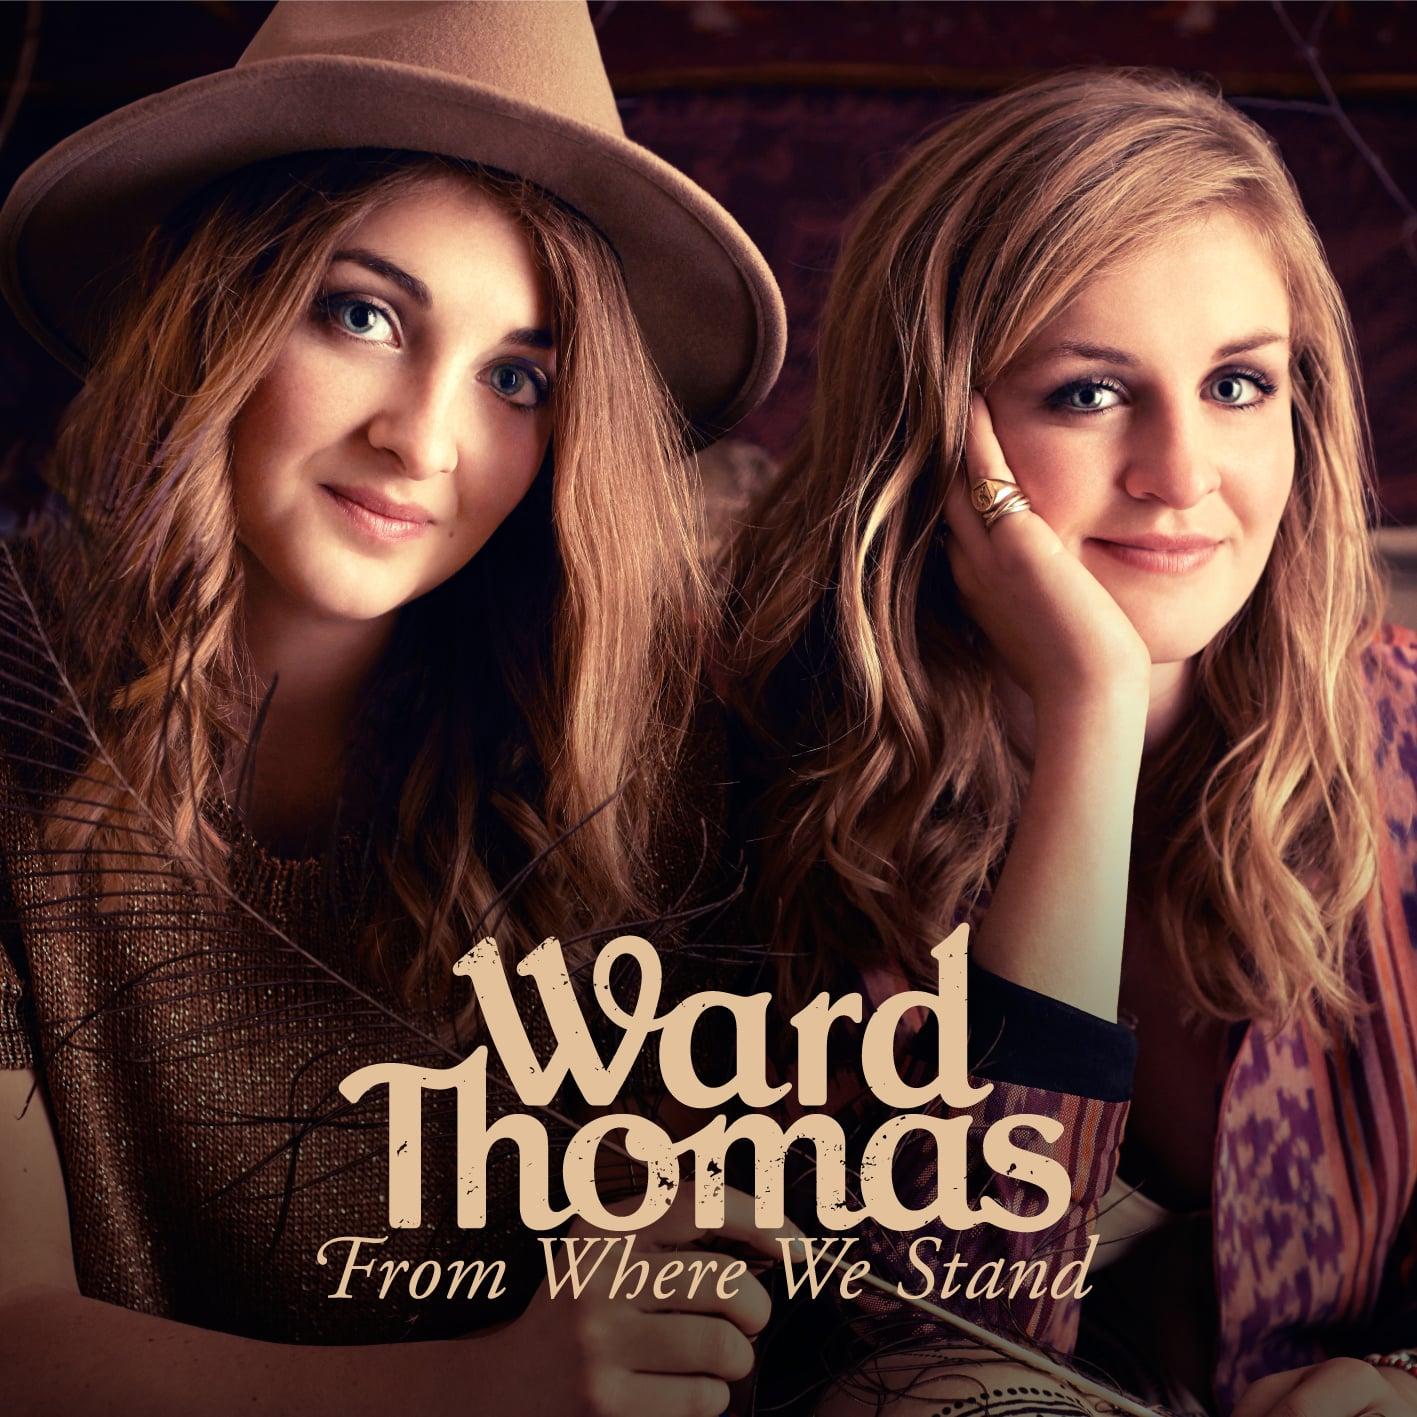 Ward Thomas - From Where We Speak